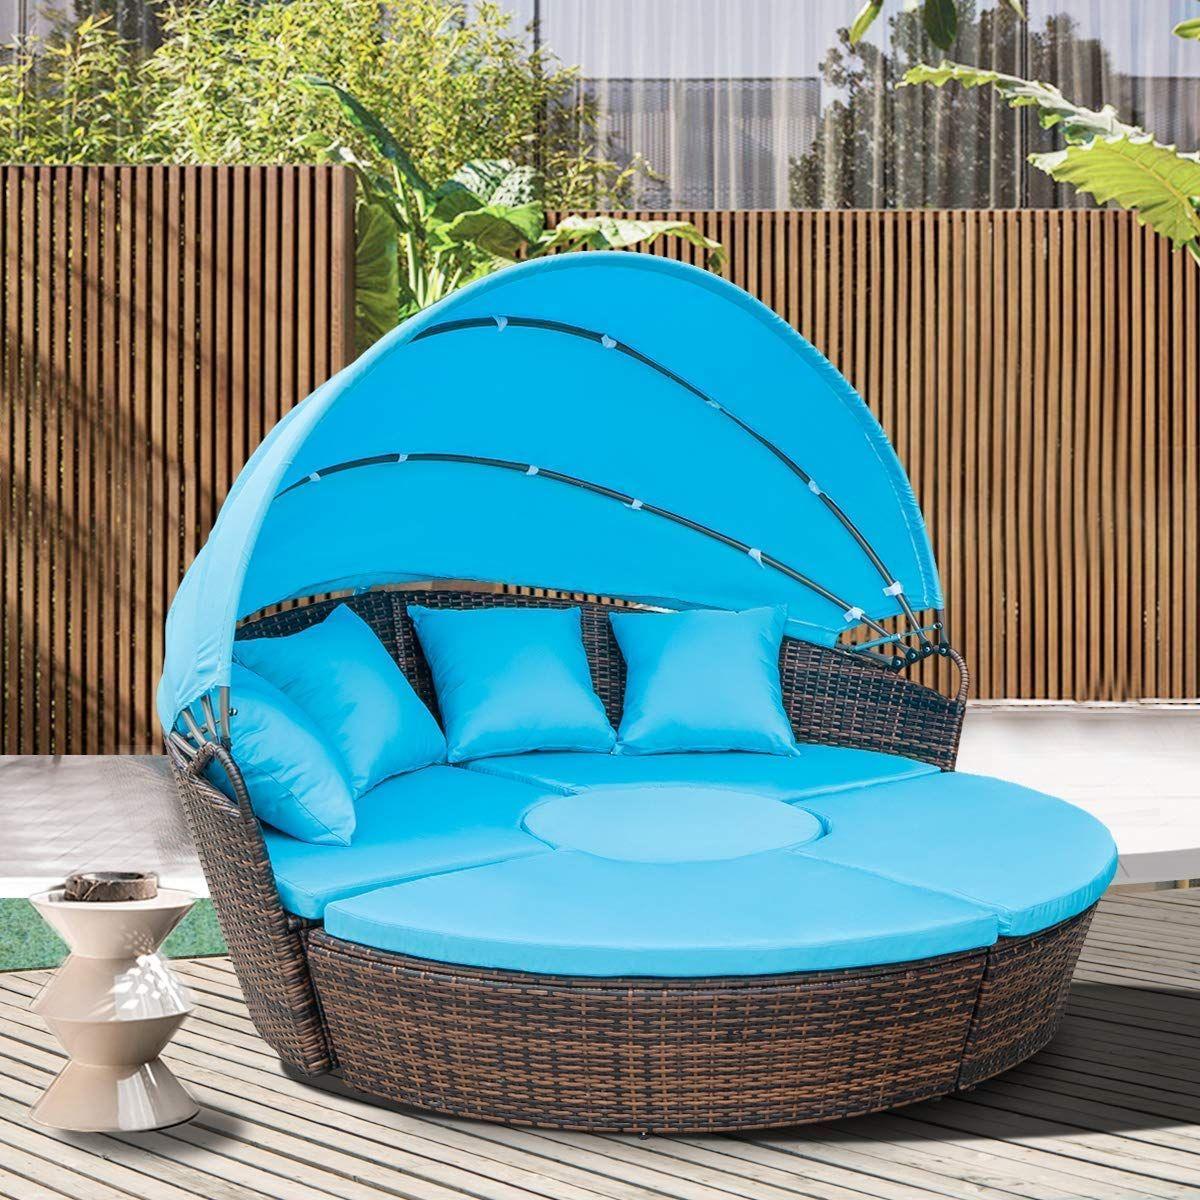 Flieks Leisure Zone Outdoor Patio Backyard Poolside Furniture